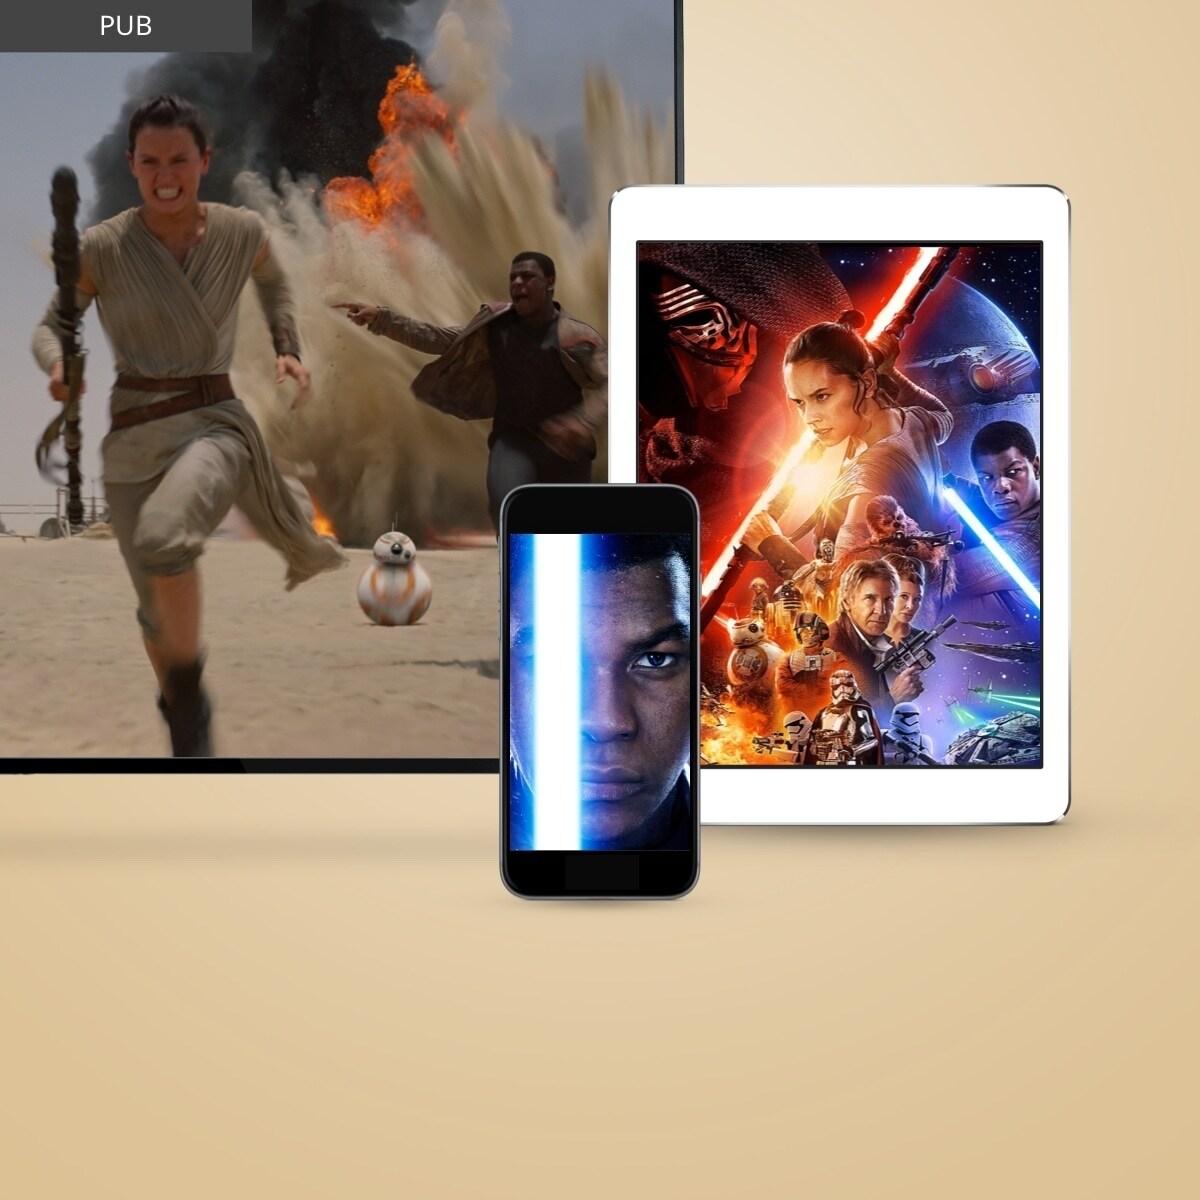 IT - Star Wars The Last Jedi - Onward Journey - Digital Downloads - Flex Grid Object - Square